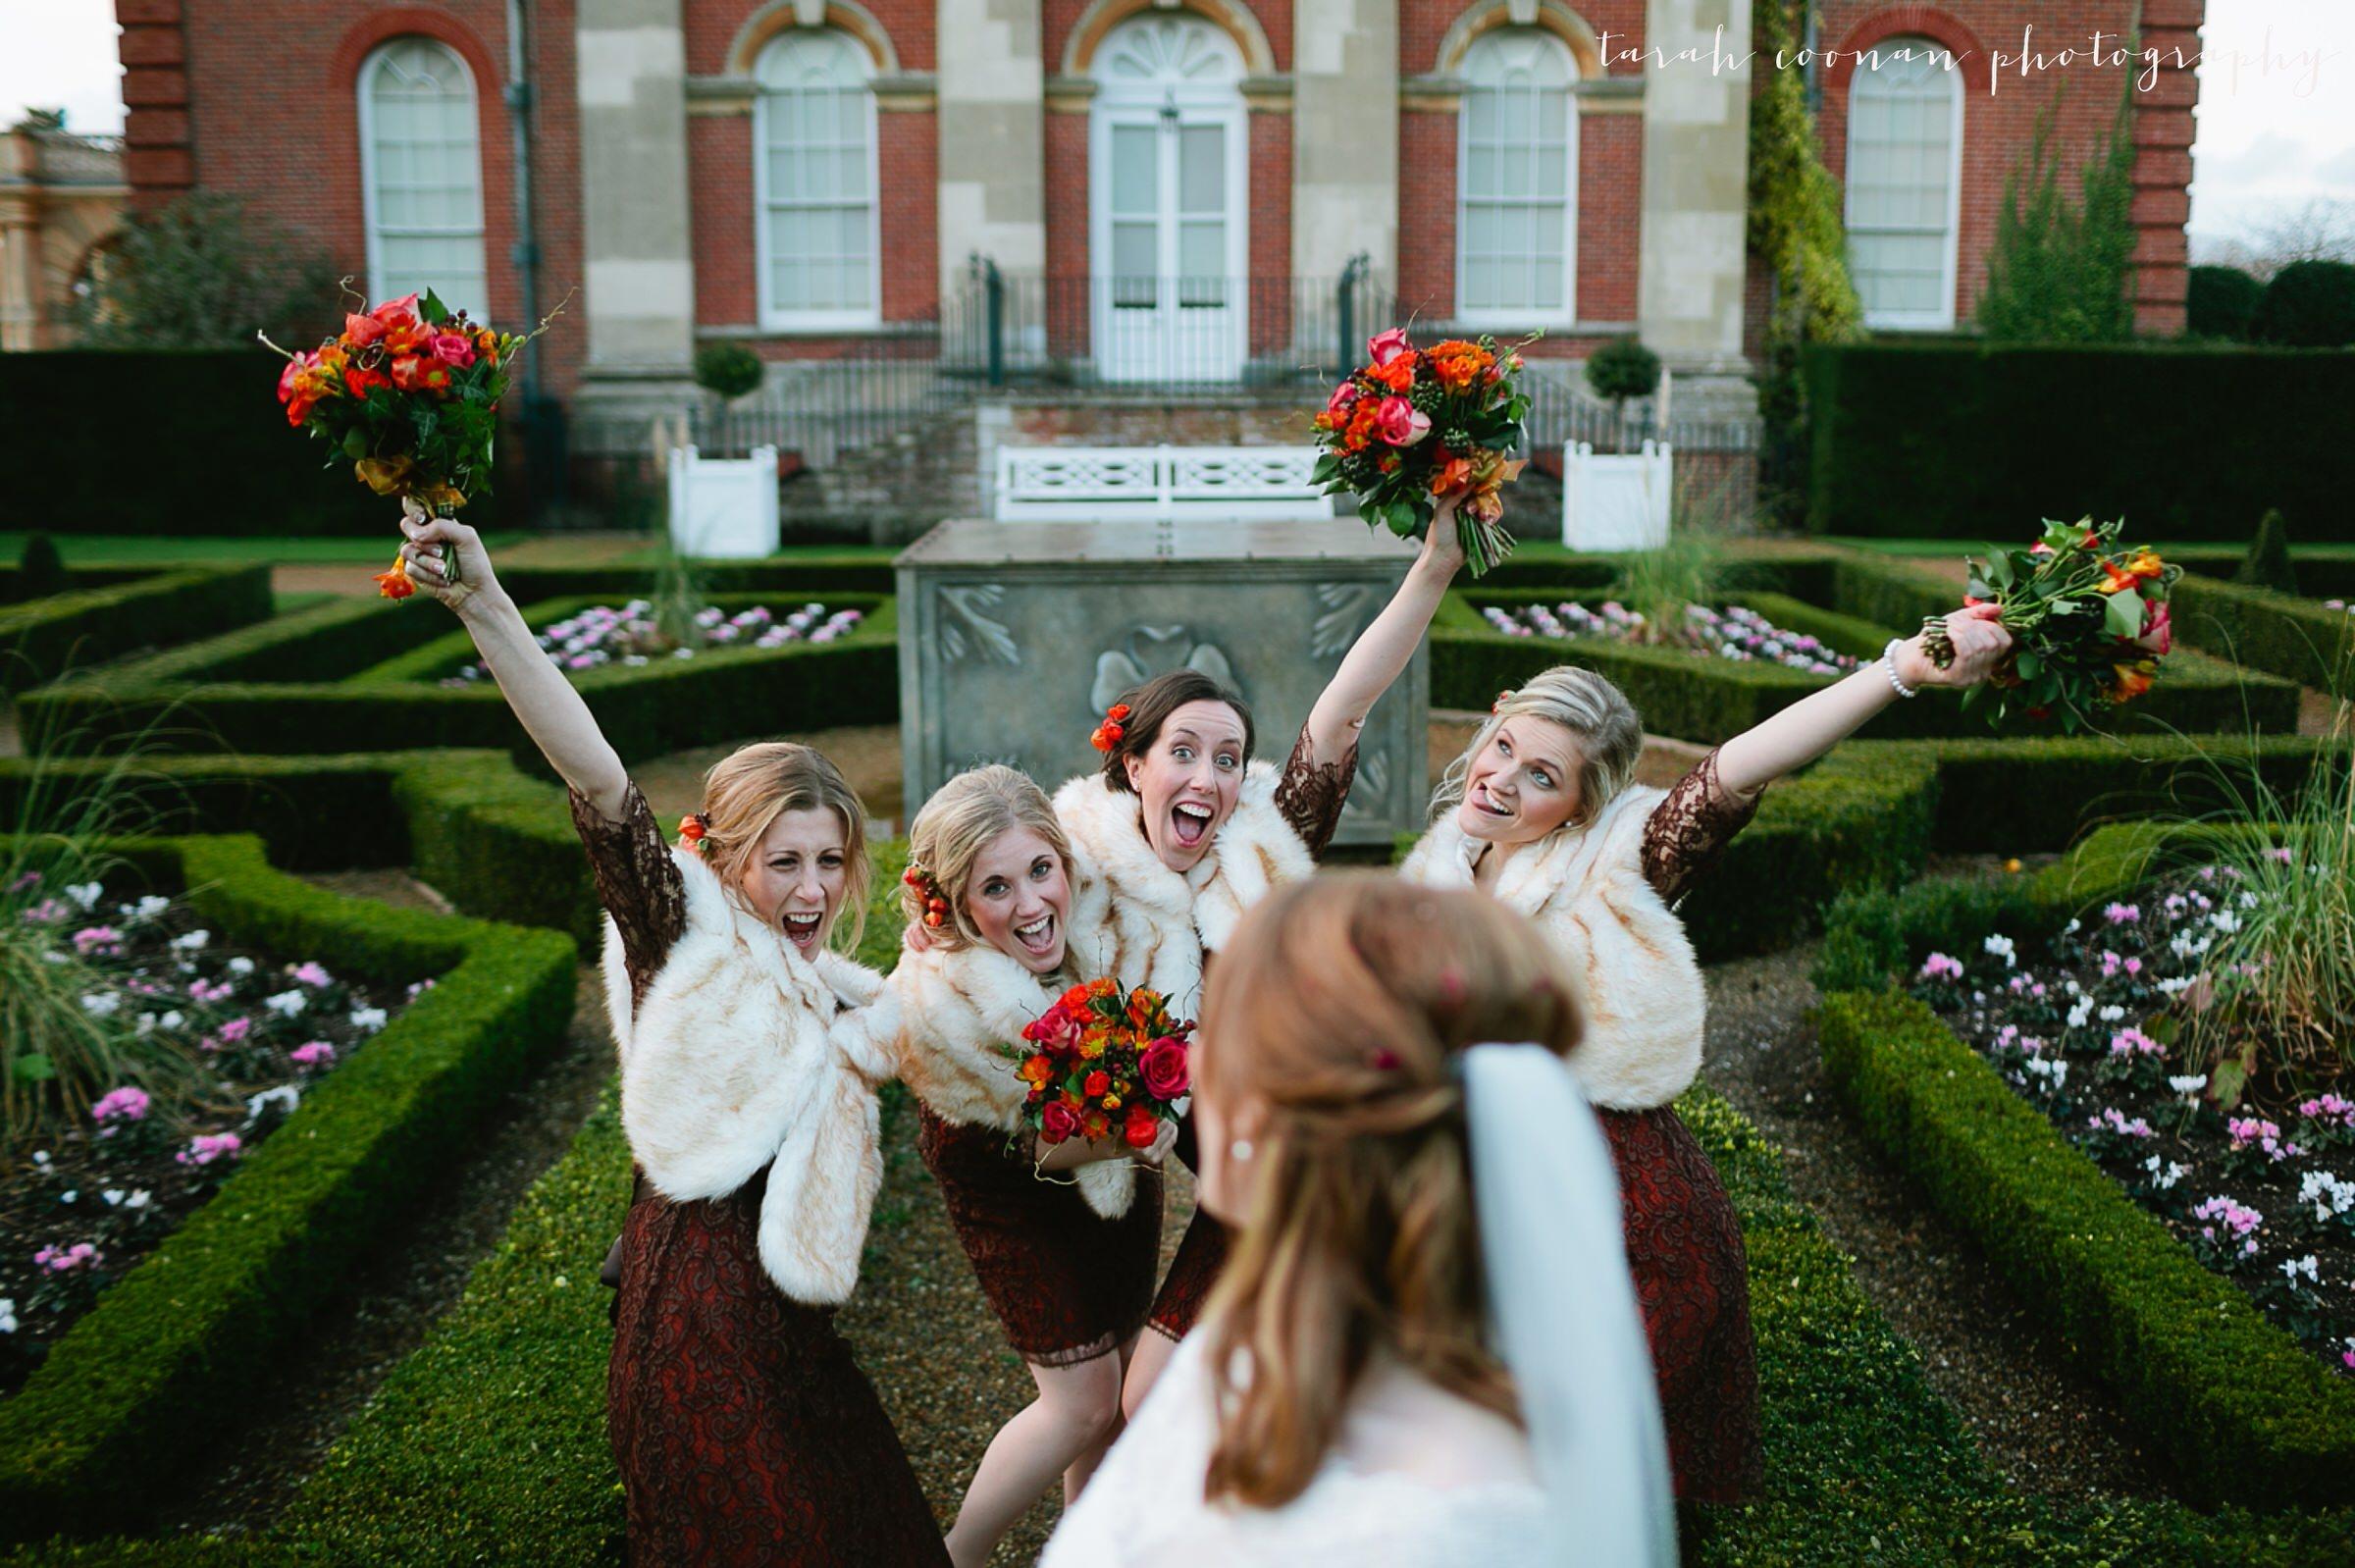 brighton-wedding-photographer38